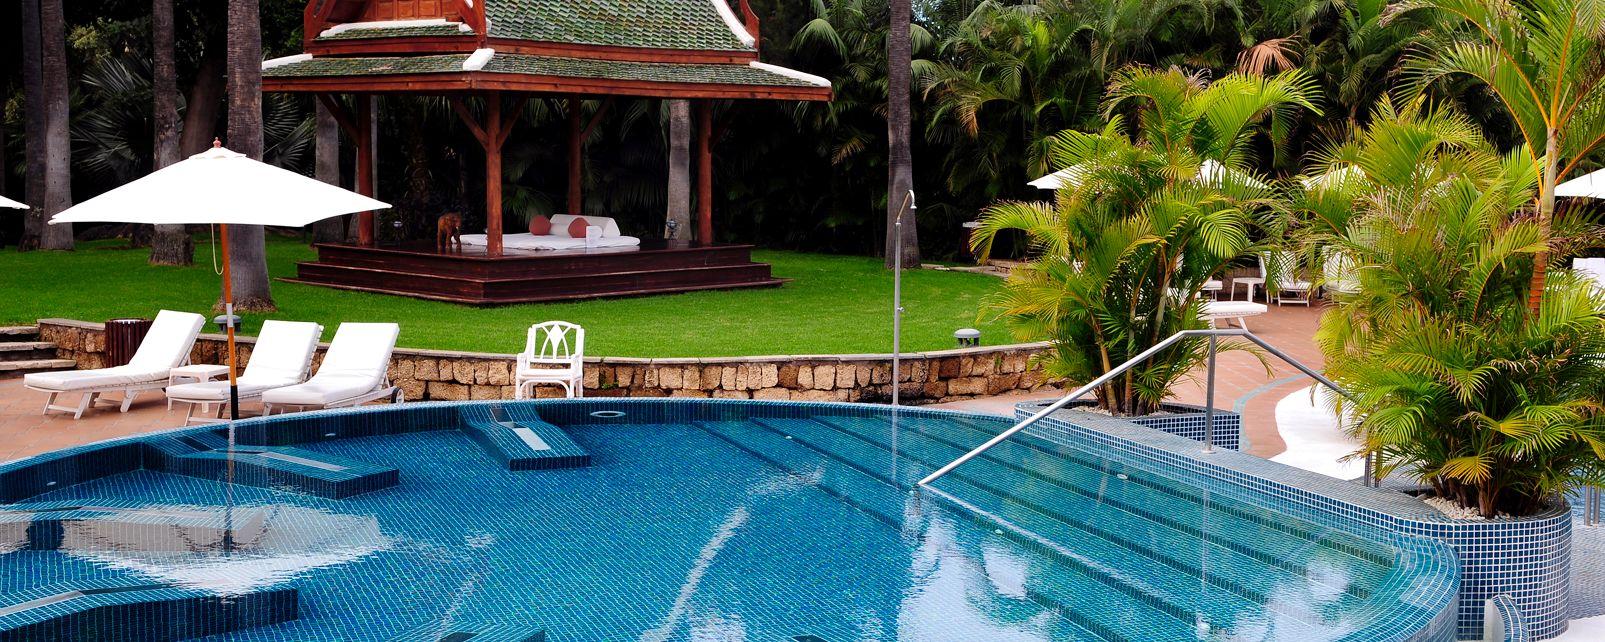 Hotel Botanico The Oriental Spa Garden